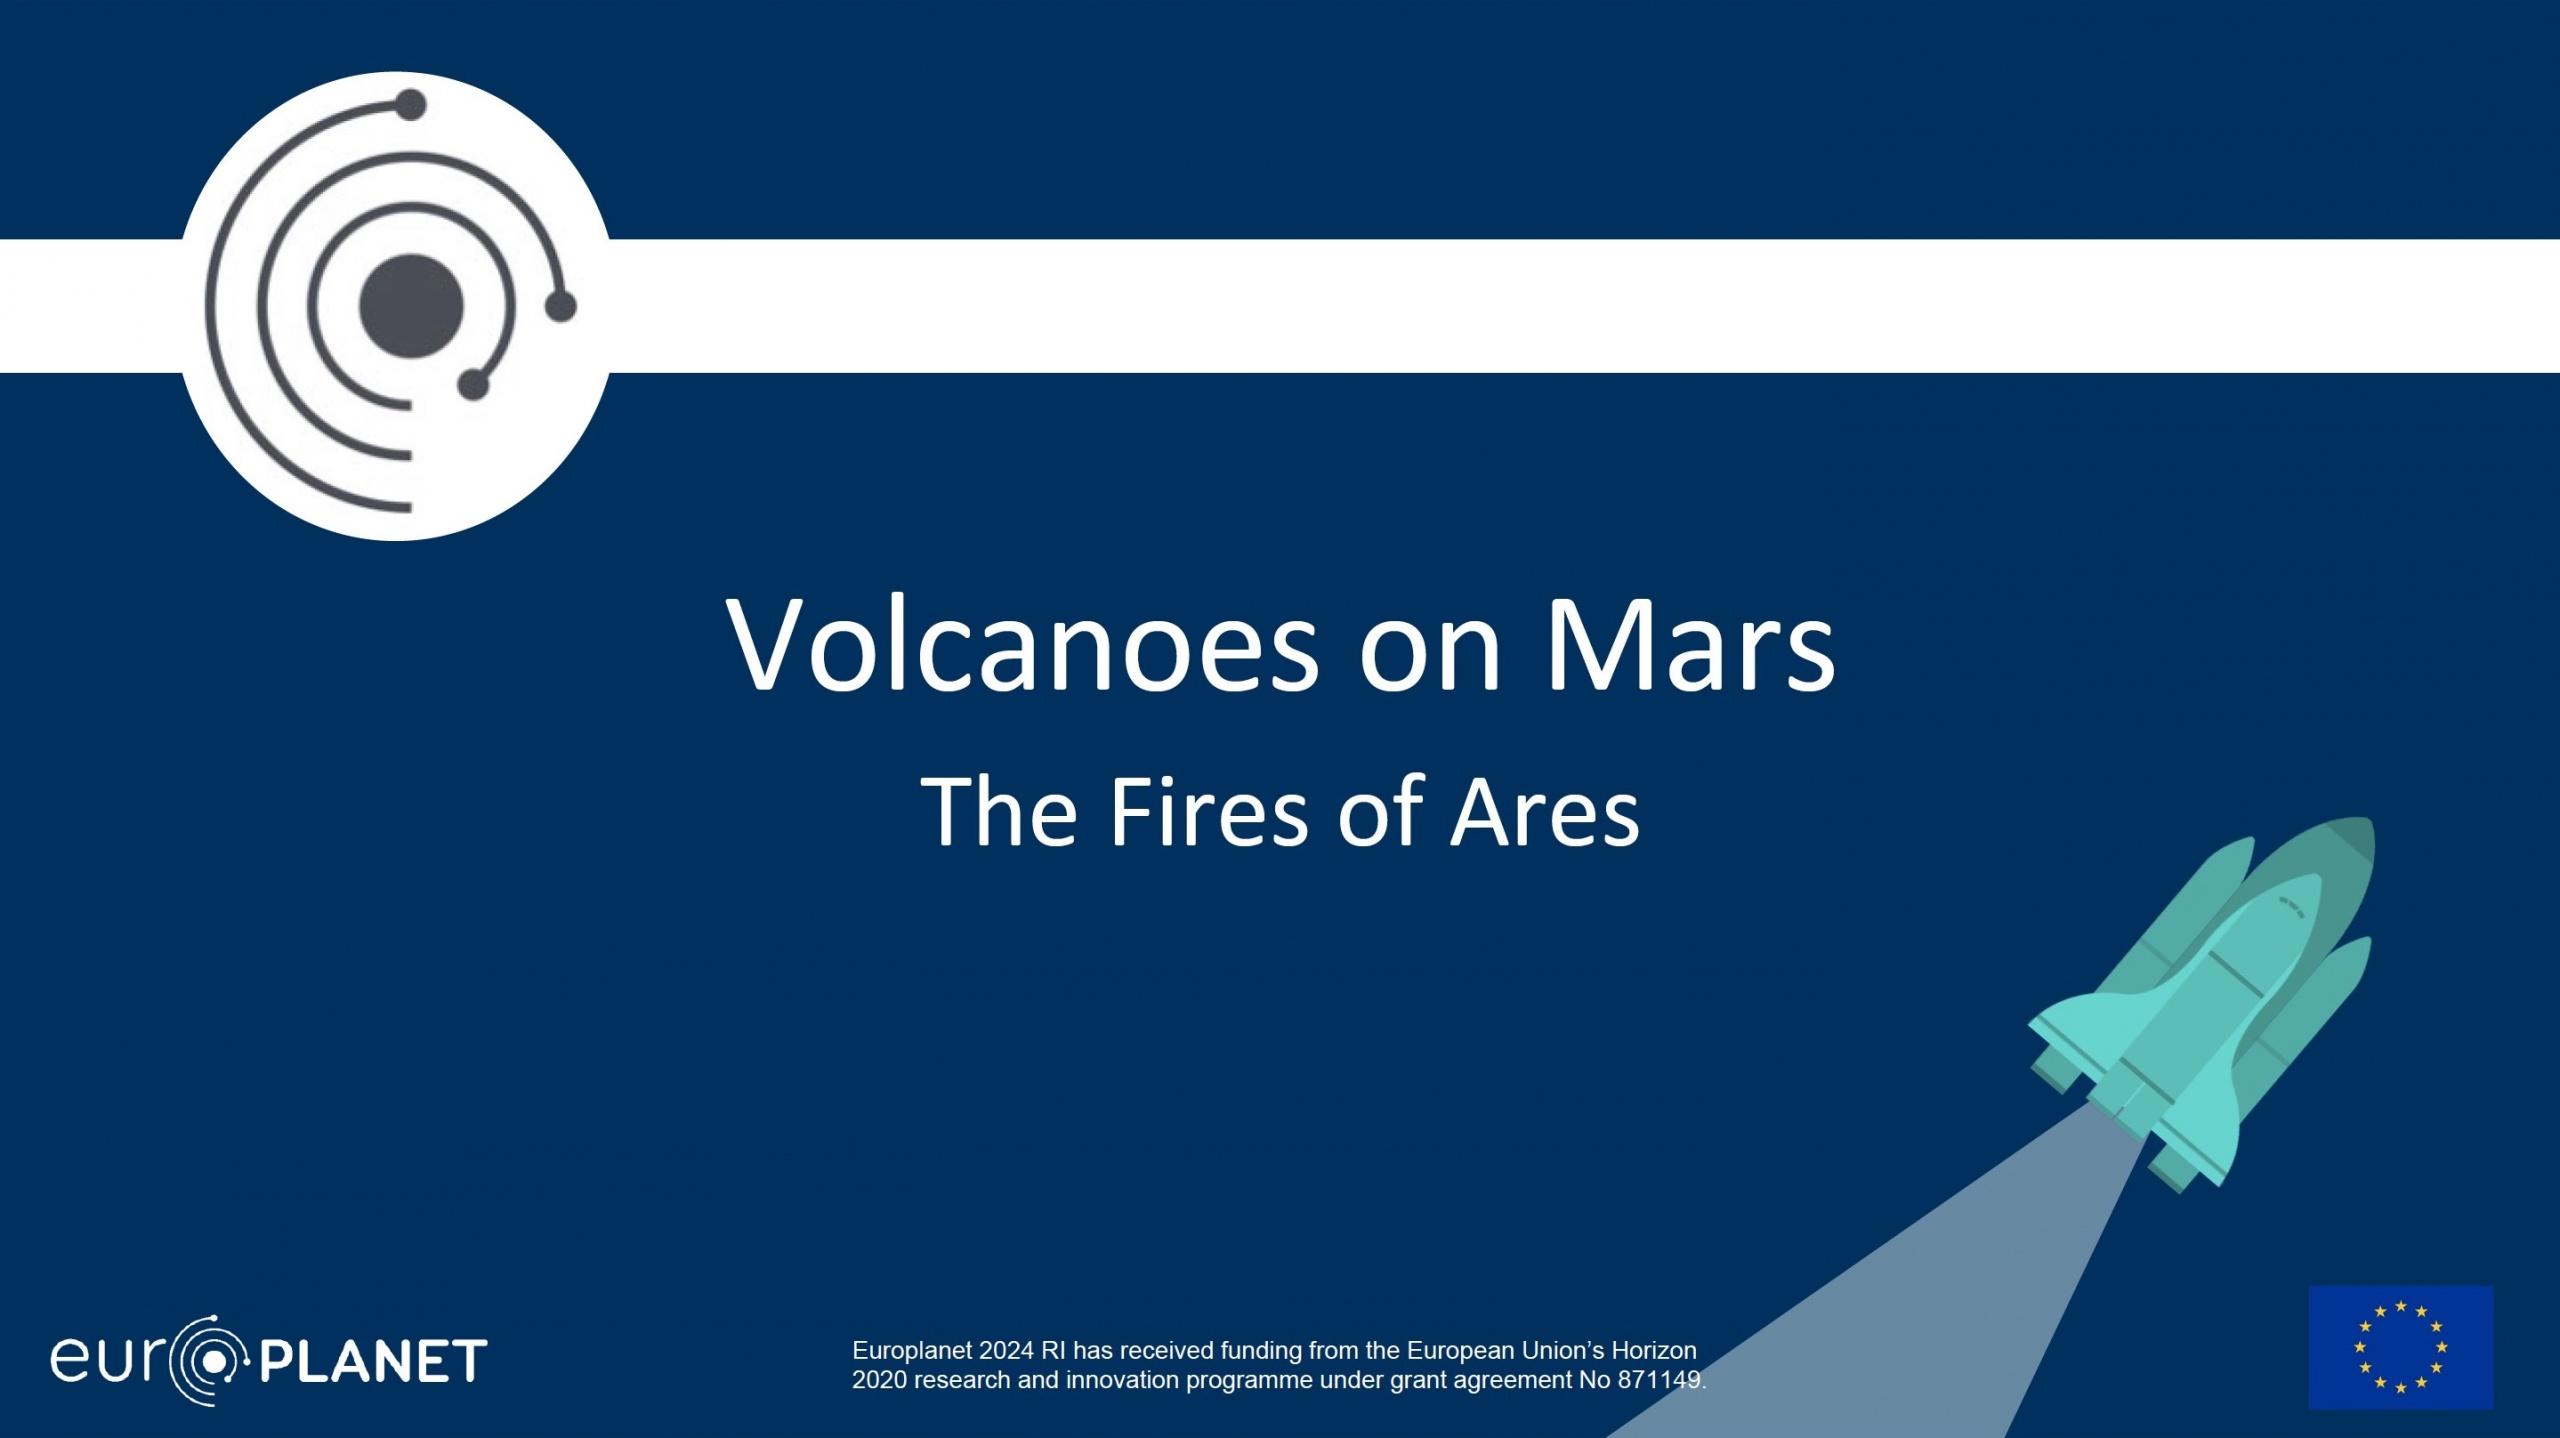 Mars Educational Resources - Volcanoes on Mars